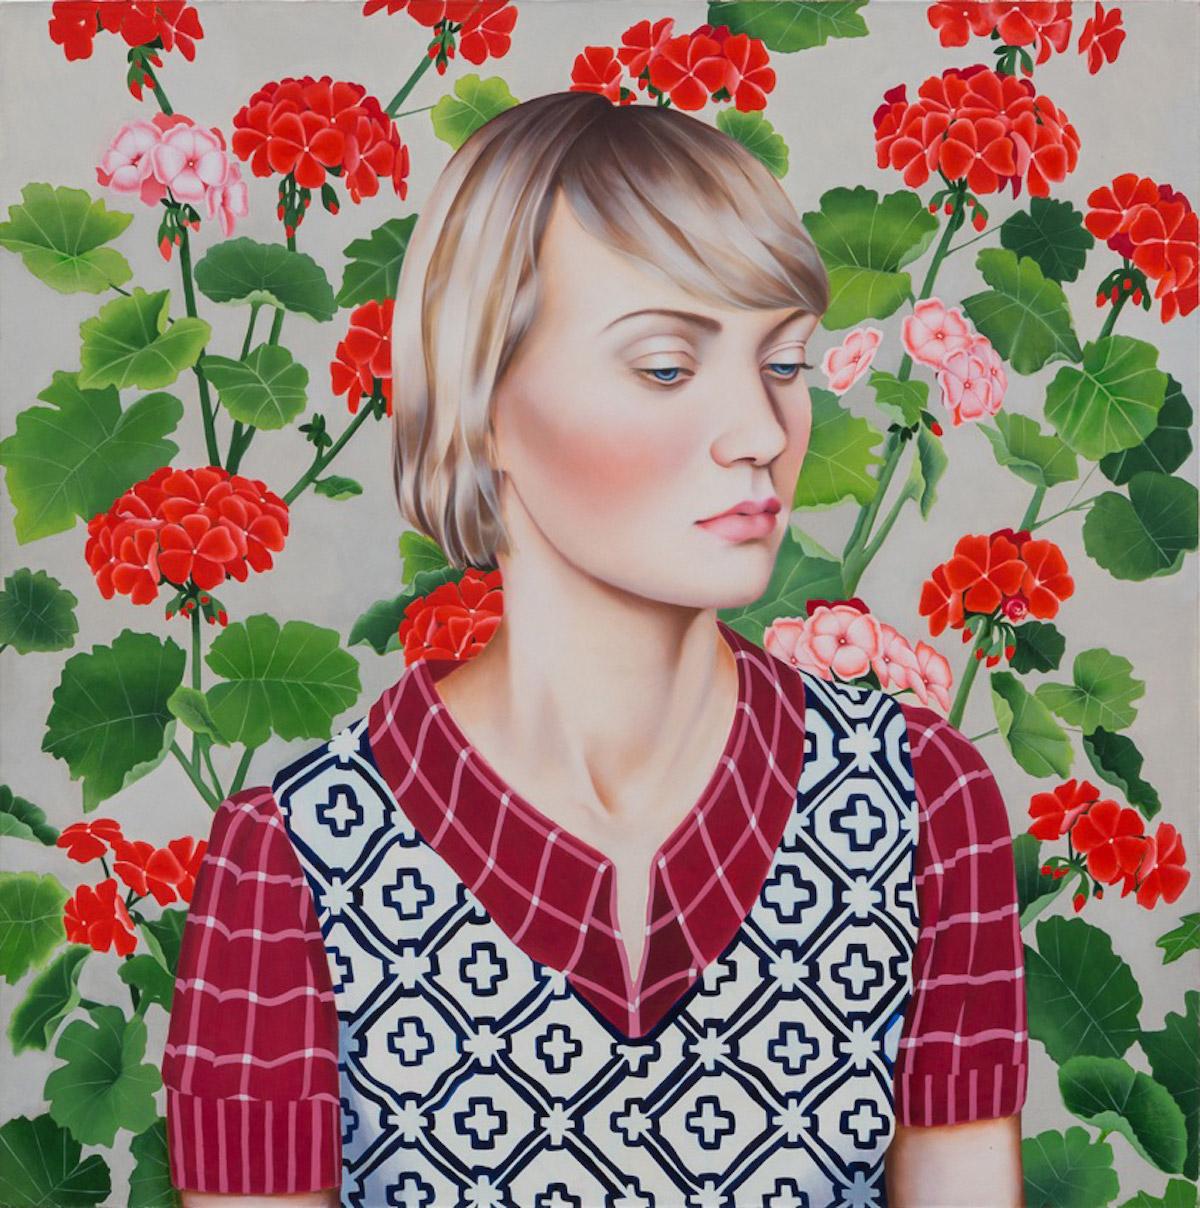 Jocelyn Hobbie